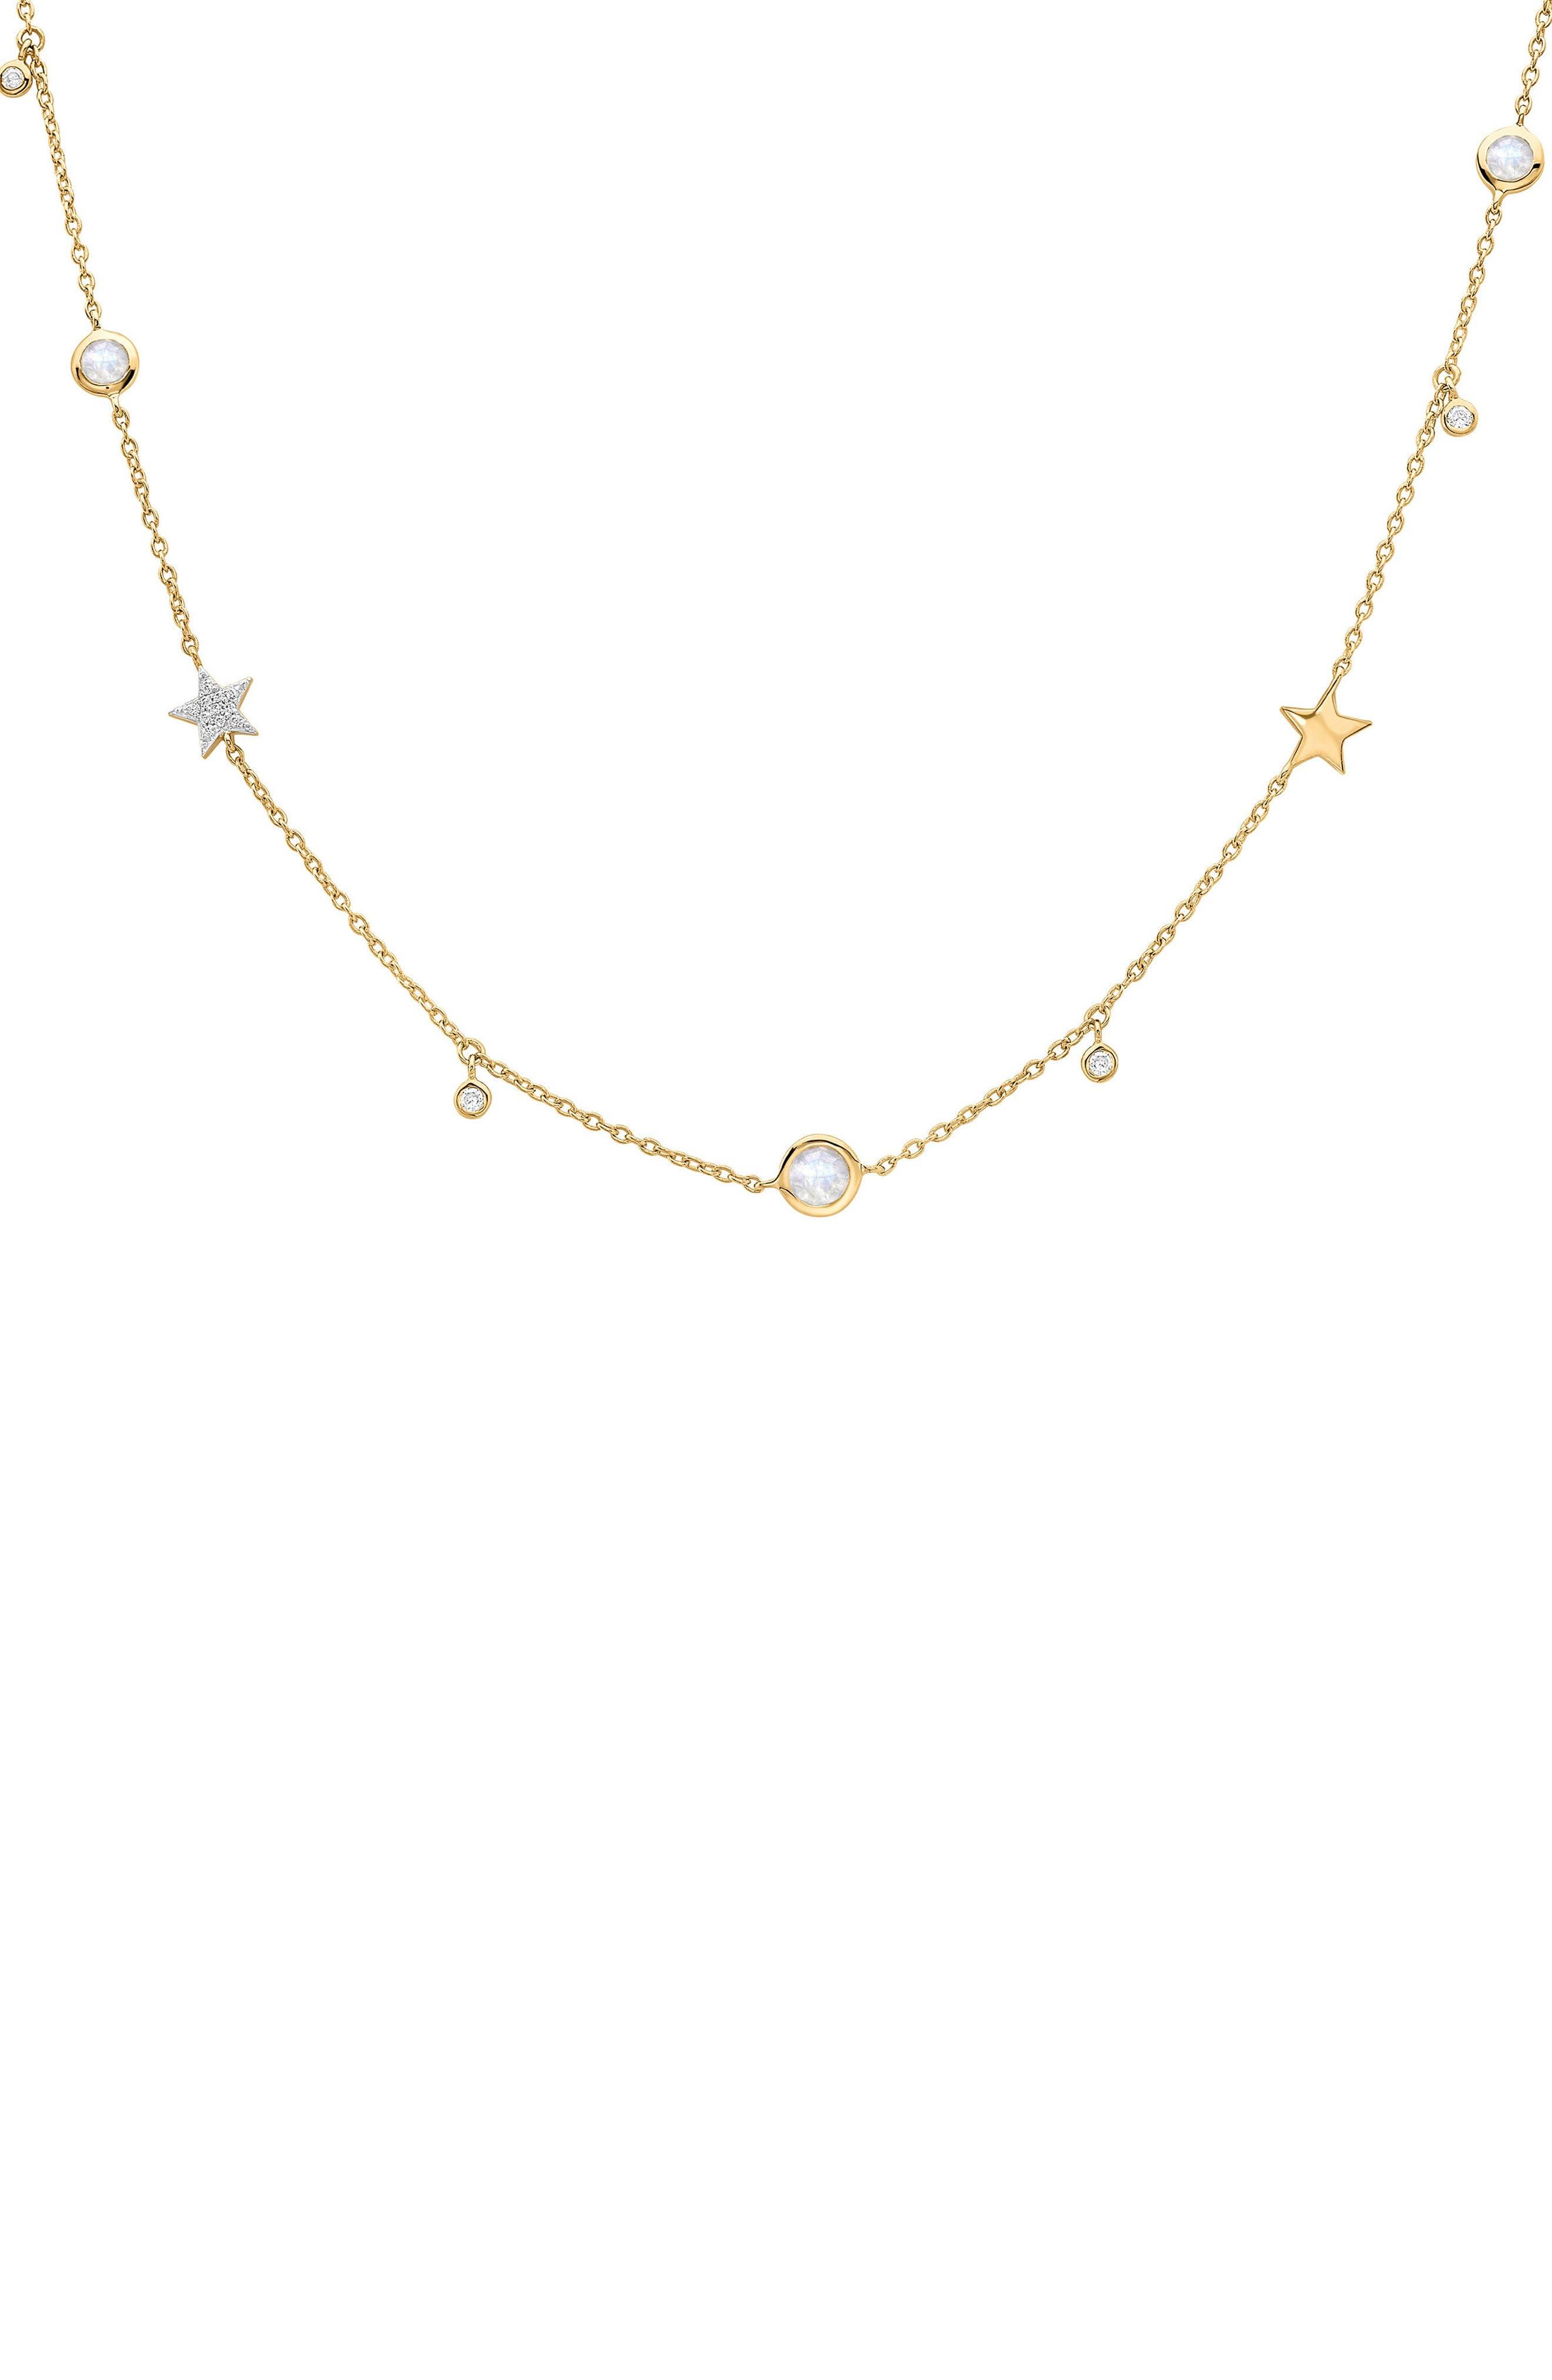 Interstellar Star Drop Necklace,                         Main,                         color, GOLD